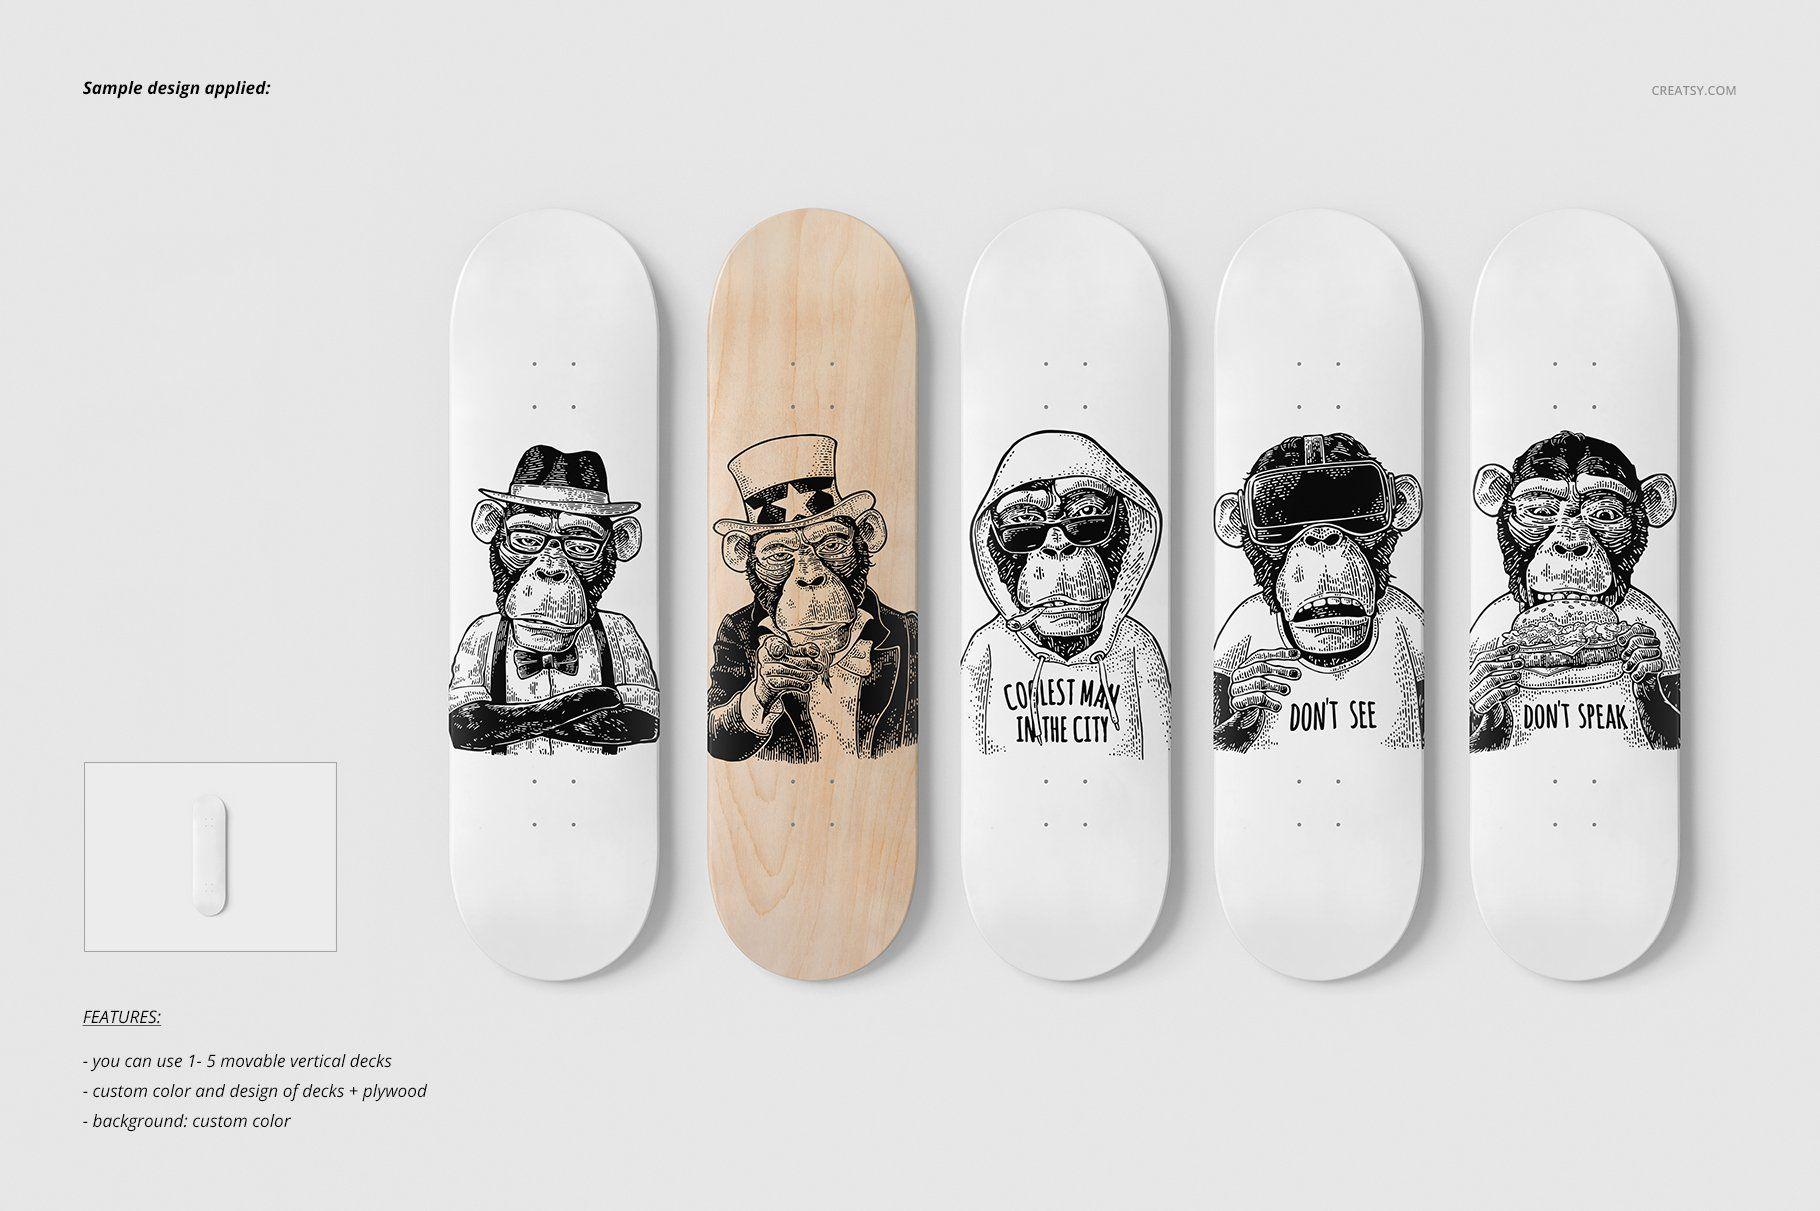 Skateboard Decks Wall Art Mockup Skateboard Wall Art Skateboard Decor Skateboard Deck Art